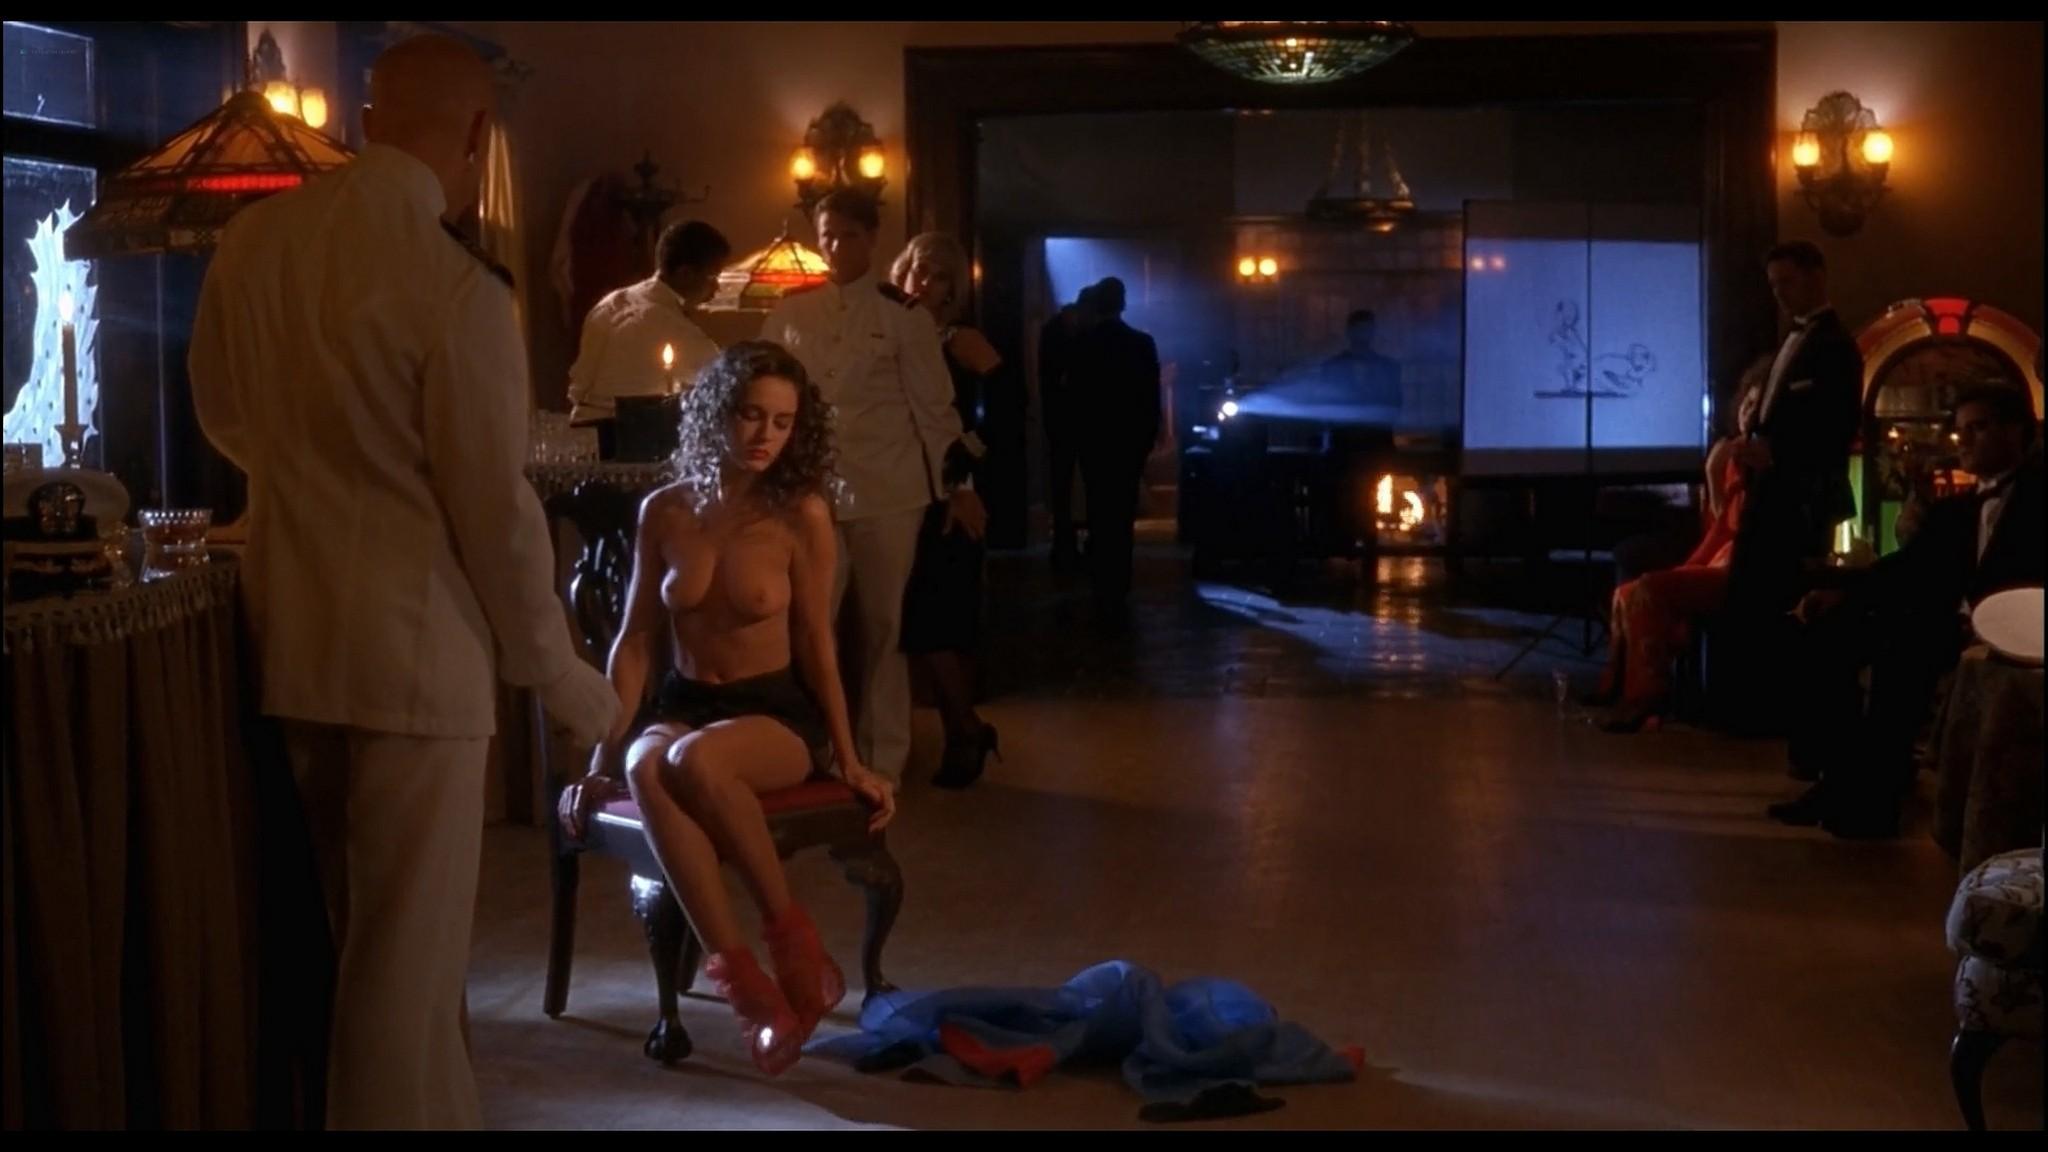 Nina Siemaszko nude sex Lydie Denier Gloria Reuben and others nude sex Wild Orchid 2 1992 1080p BluRay 5